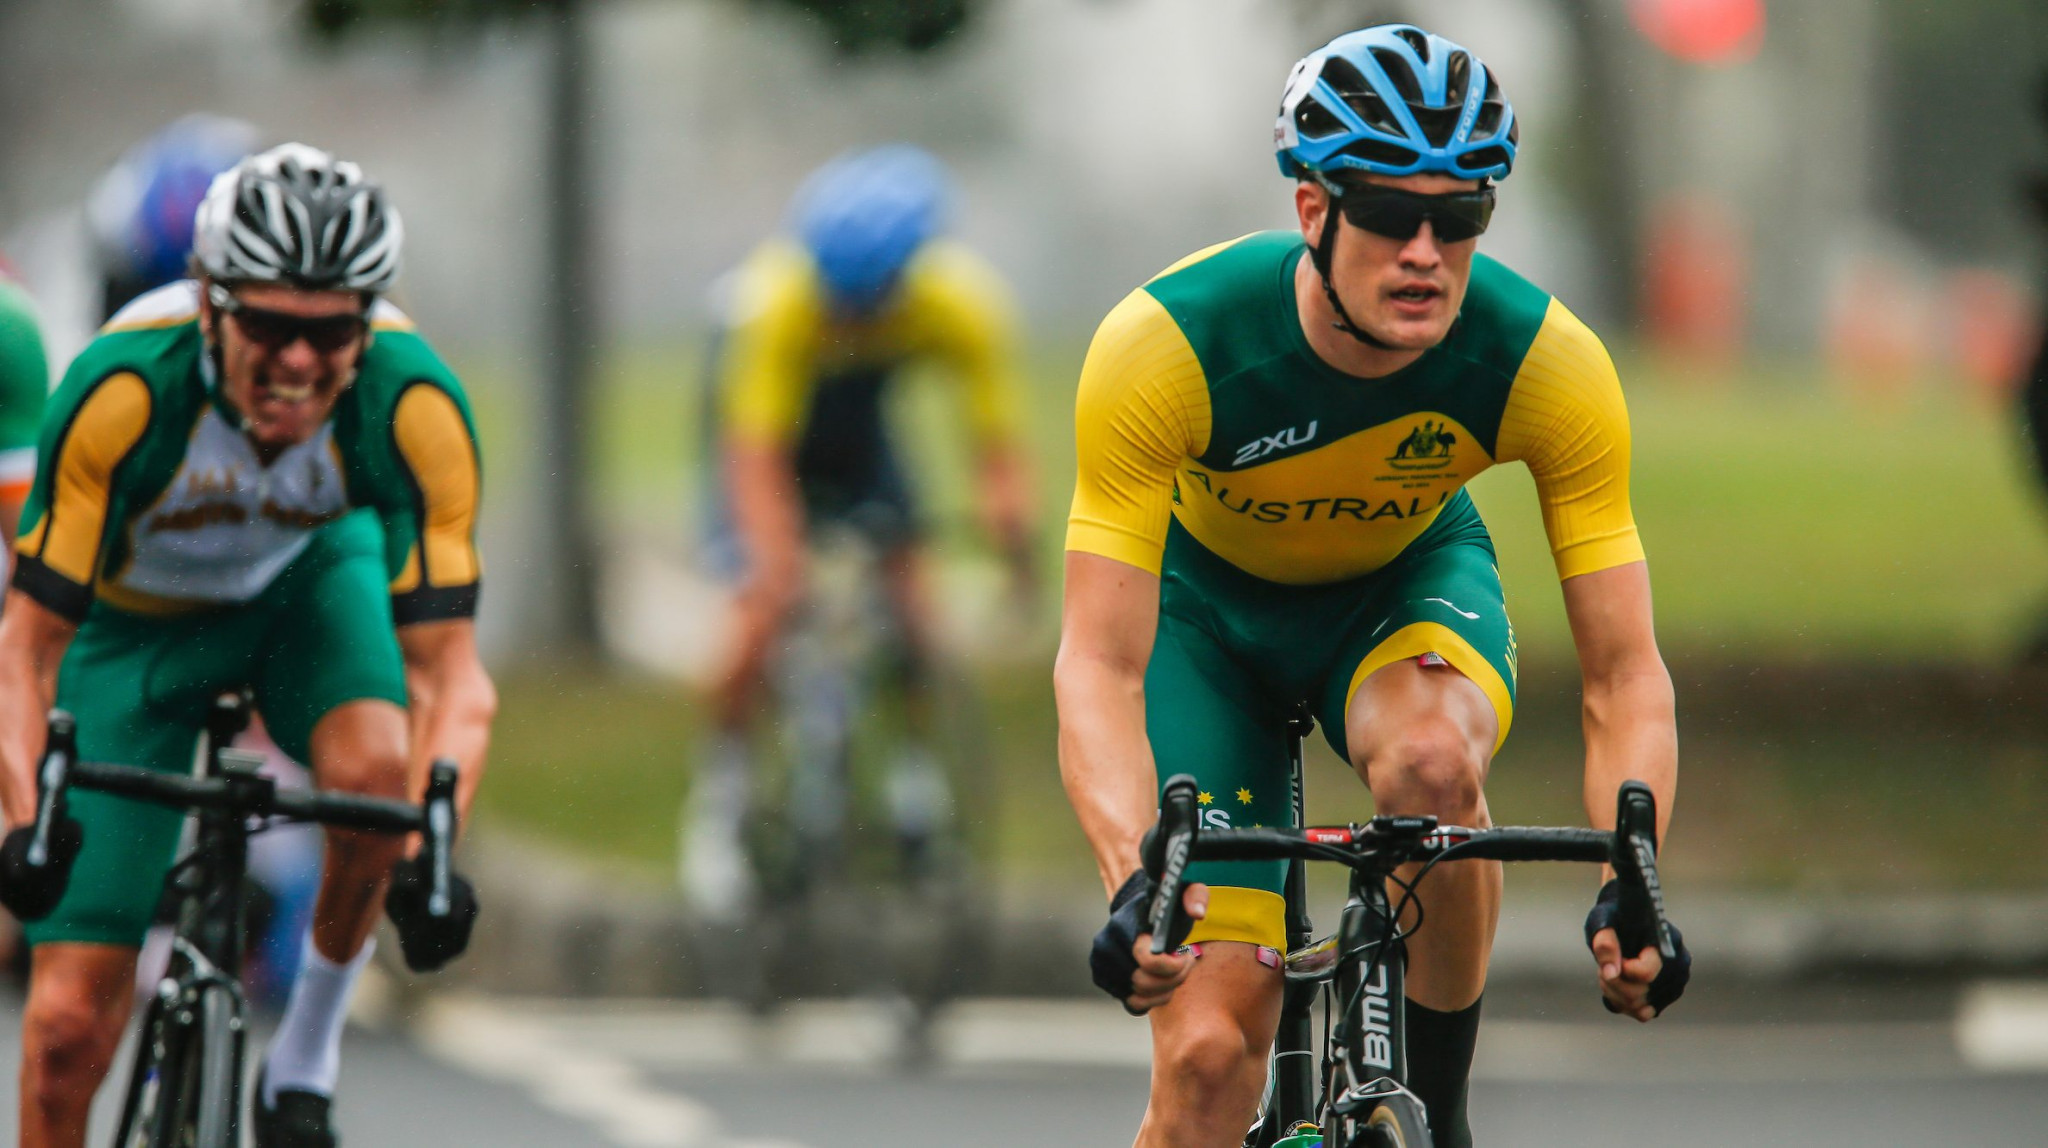 Australia's world-class Para-cyclists crowned national champions in Ballarat